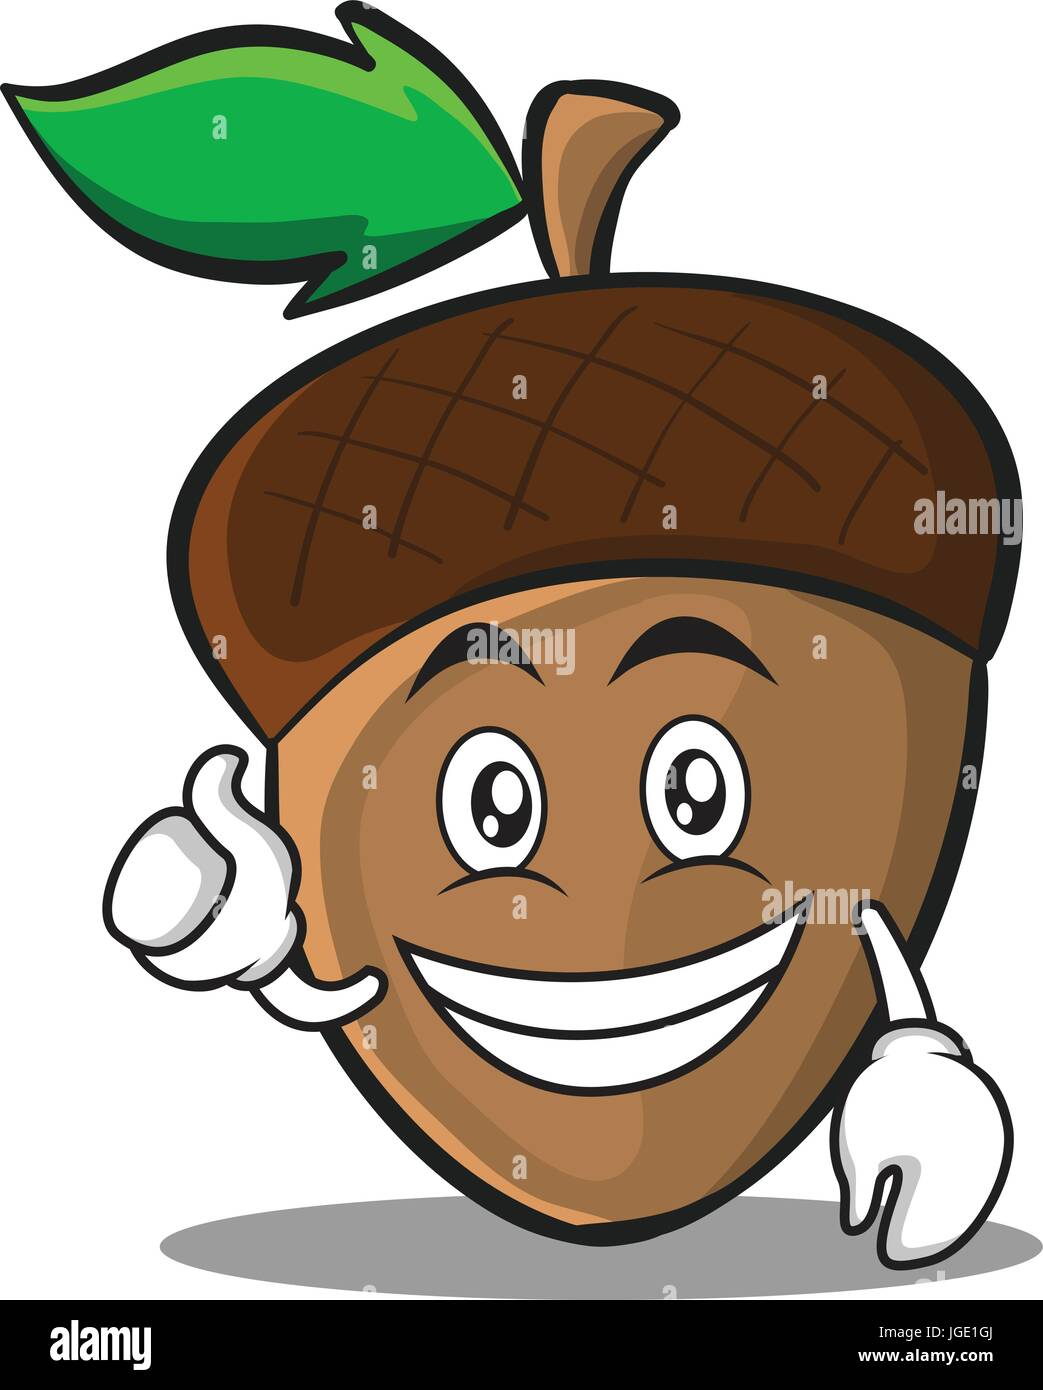 Optimistic acorn cartoon character style - Stock Image